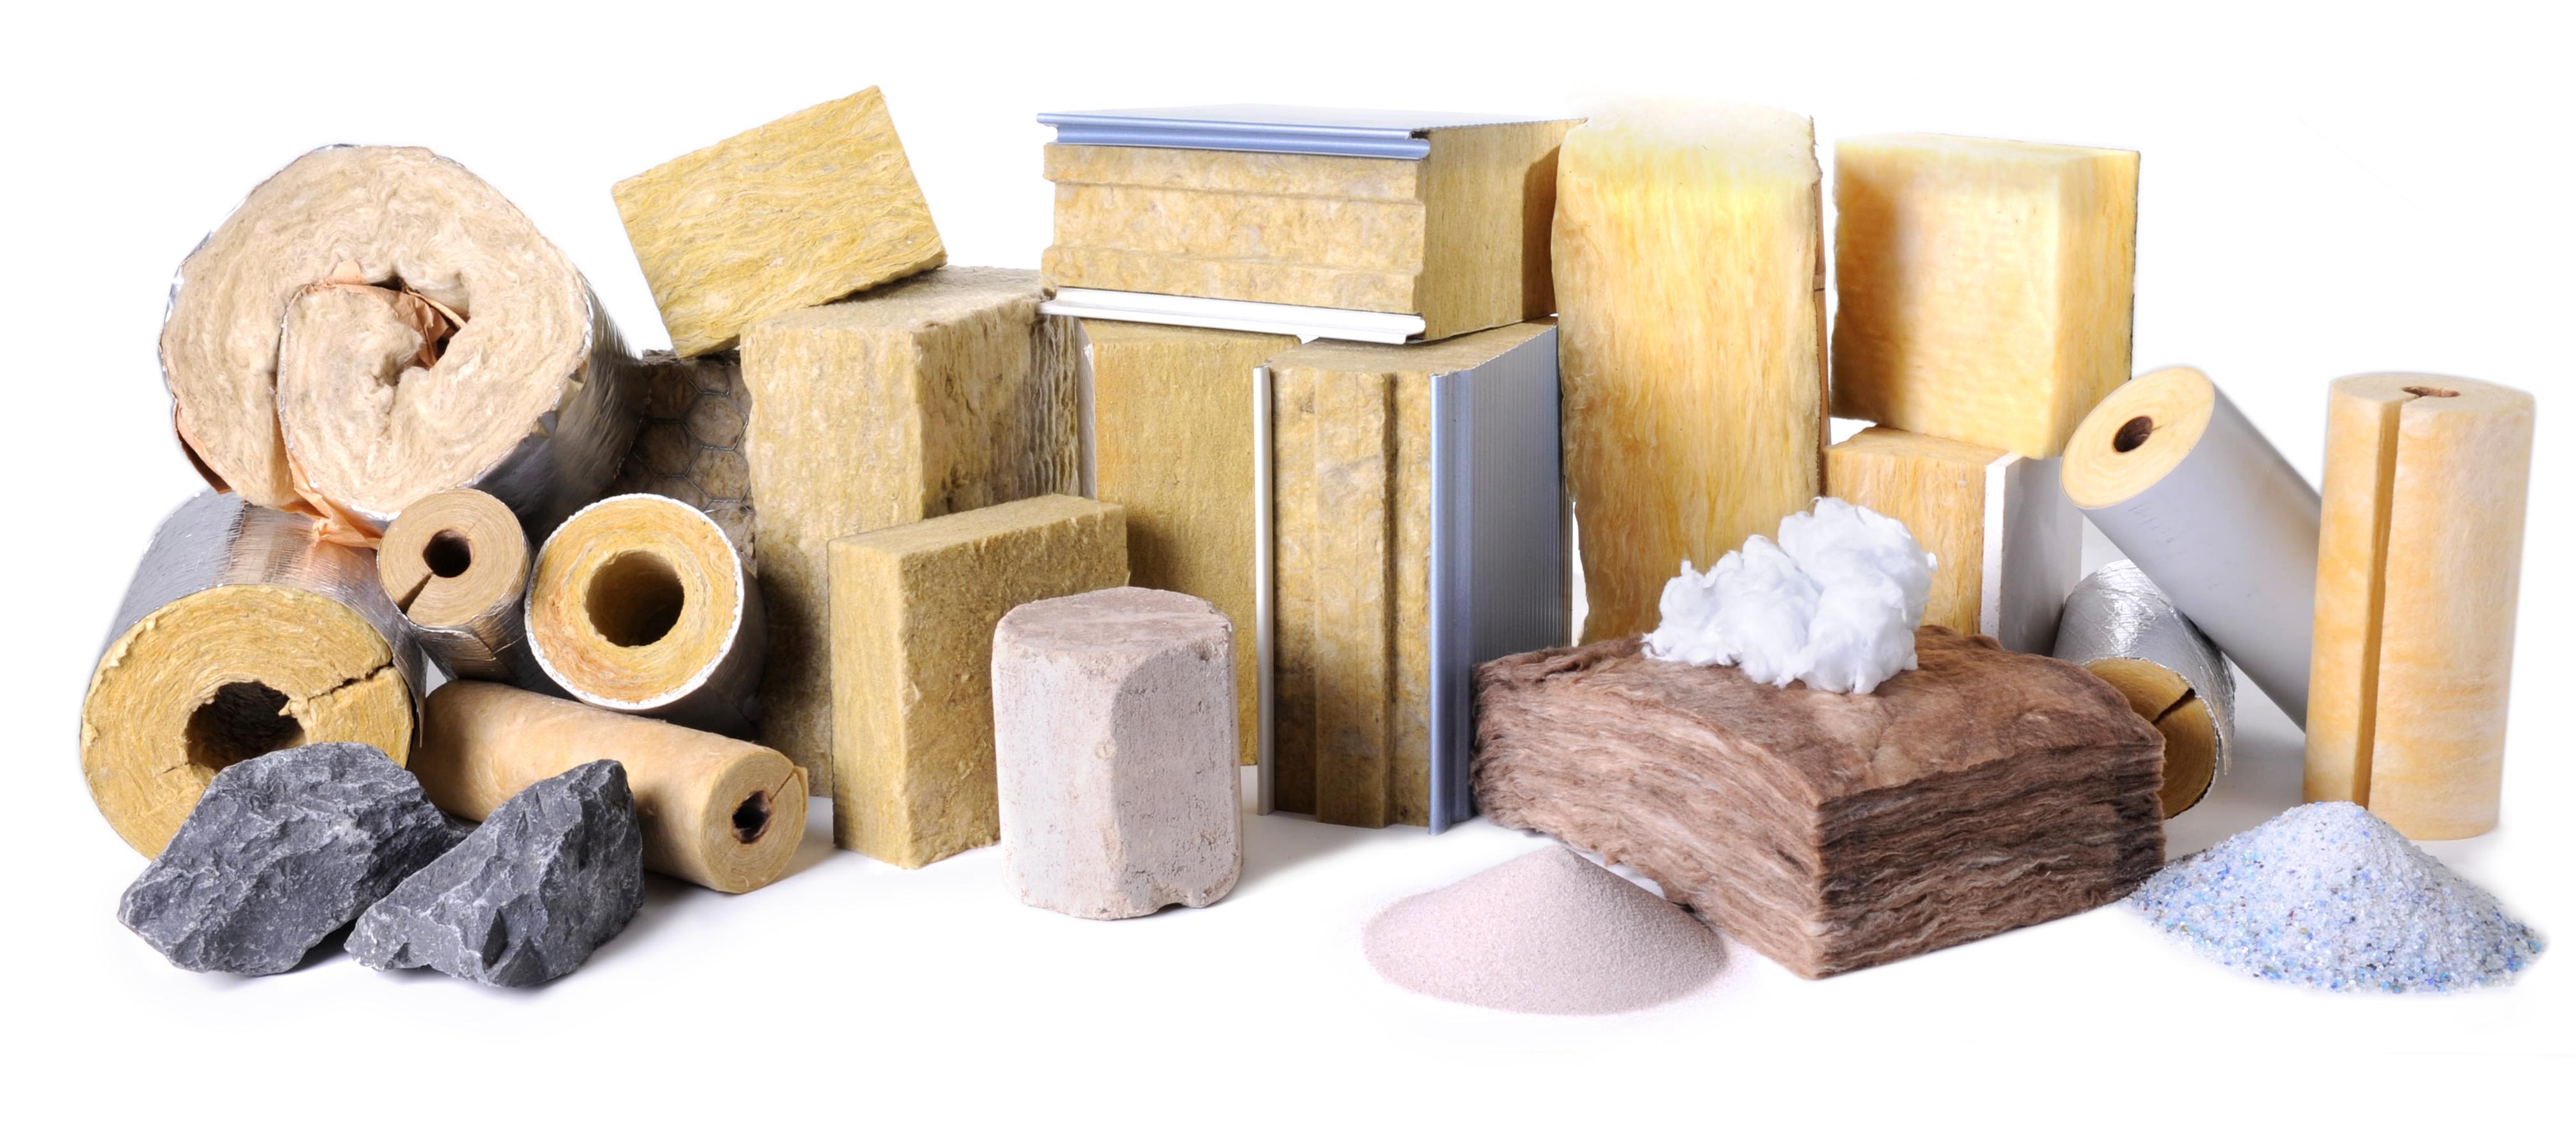 Aislamiento t rmico o como hacer tu vivienda m s eficiente - Mejor aislante termico ...